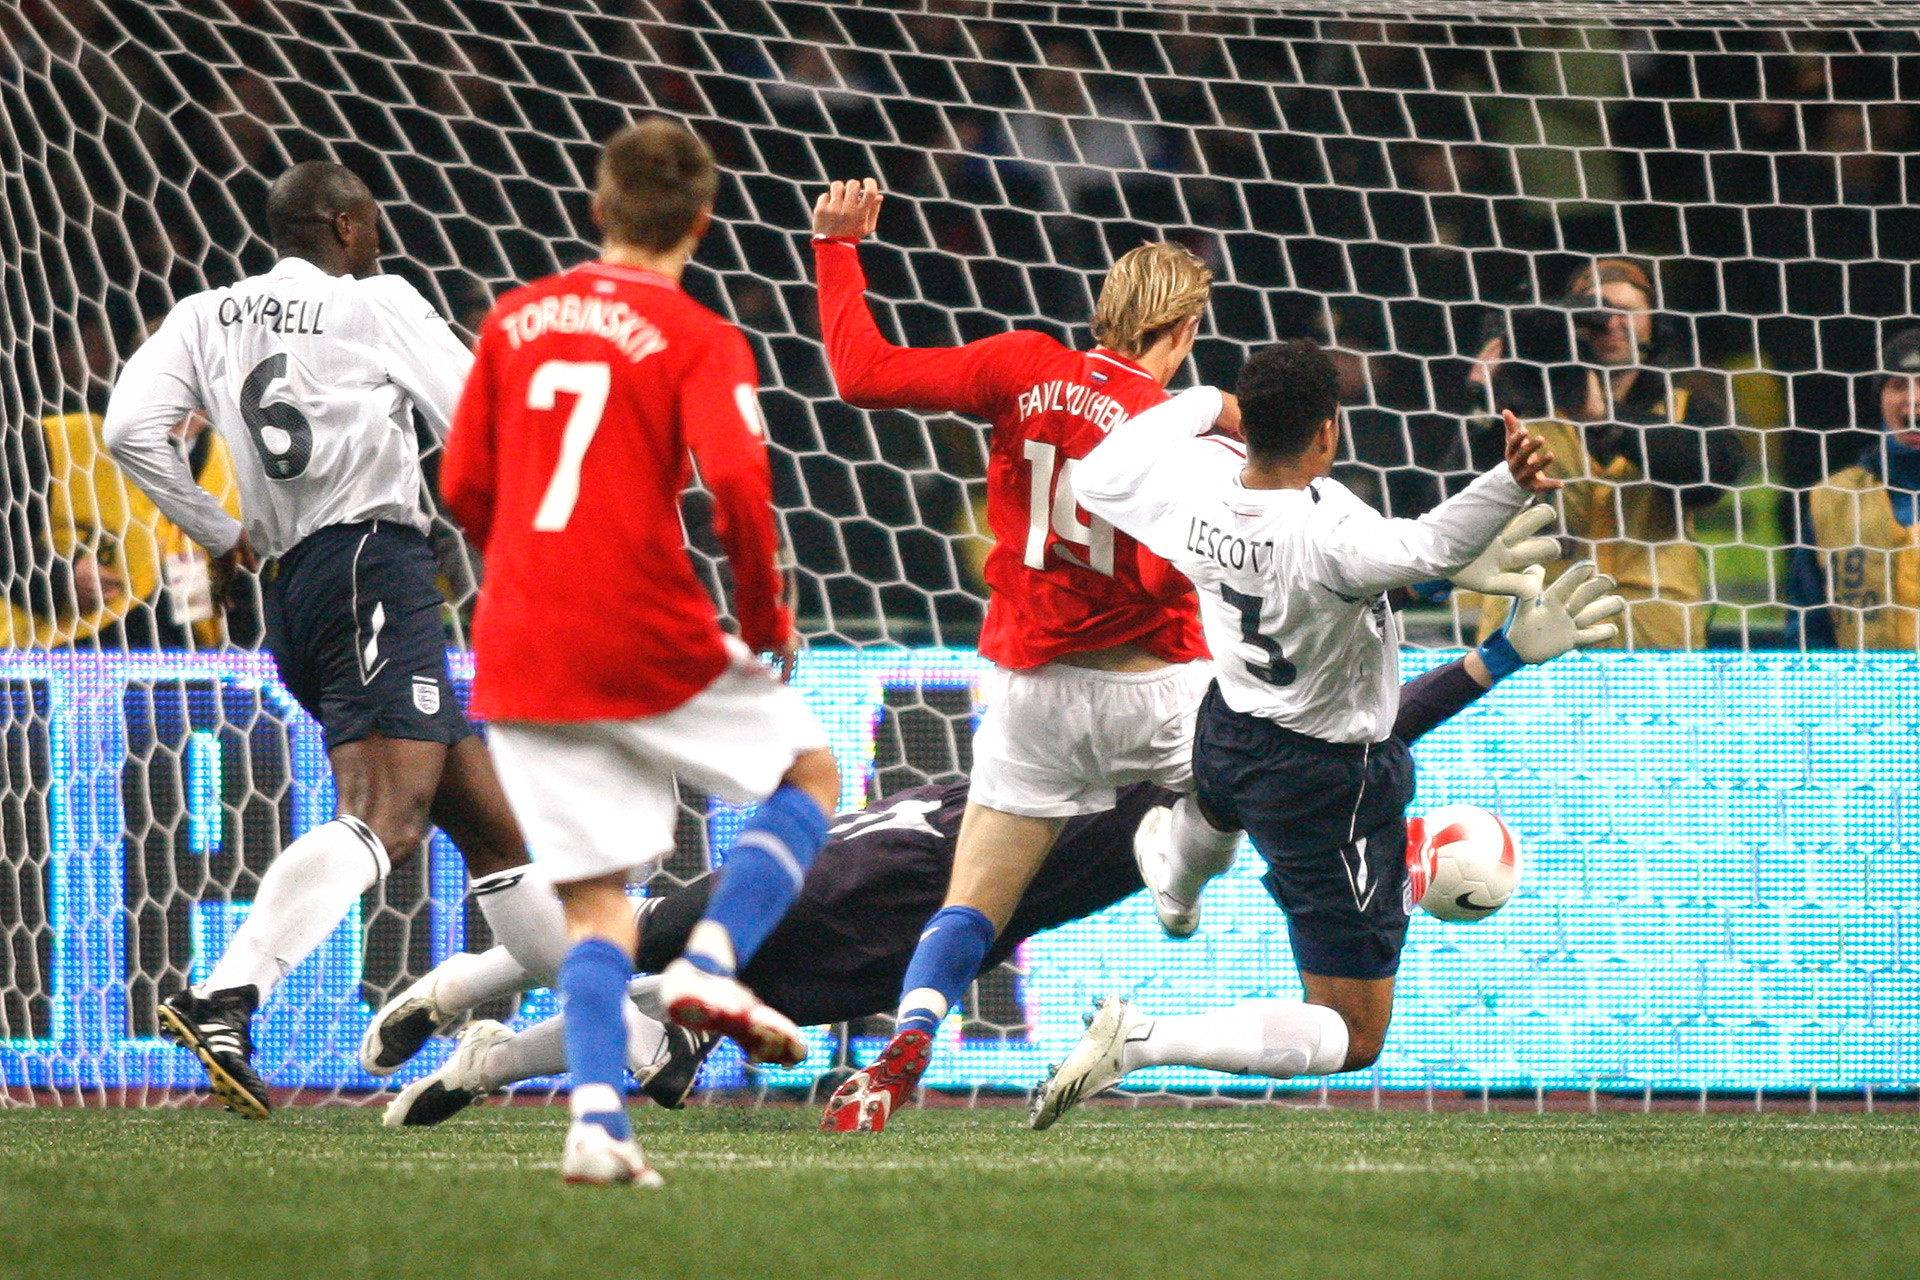 Roman Pavliutchenko marcando na partida contra a Inglaterra (2 a 1); esta vitória levou a Rússia à Euro-2008, deixando a equipe inglesa para trás